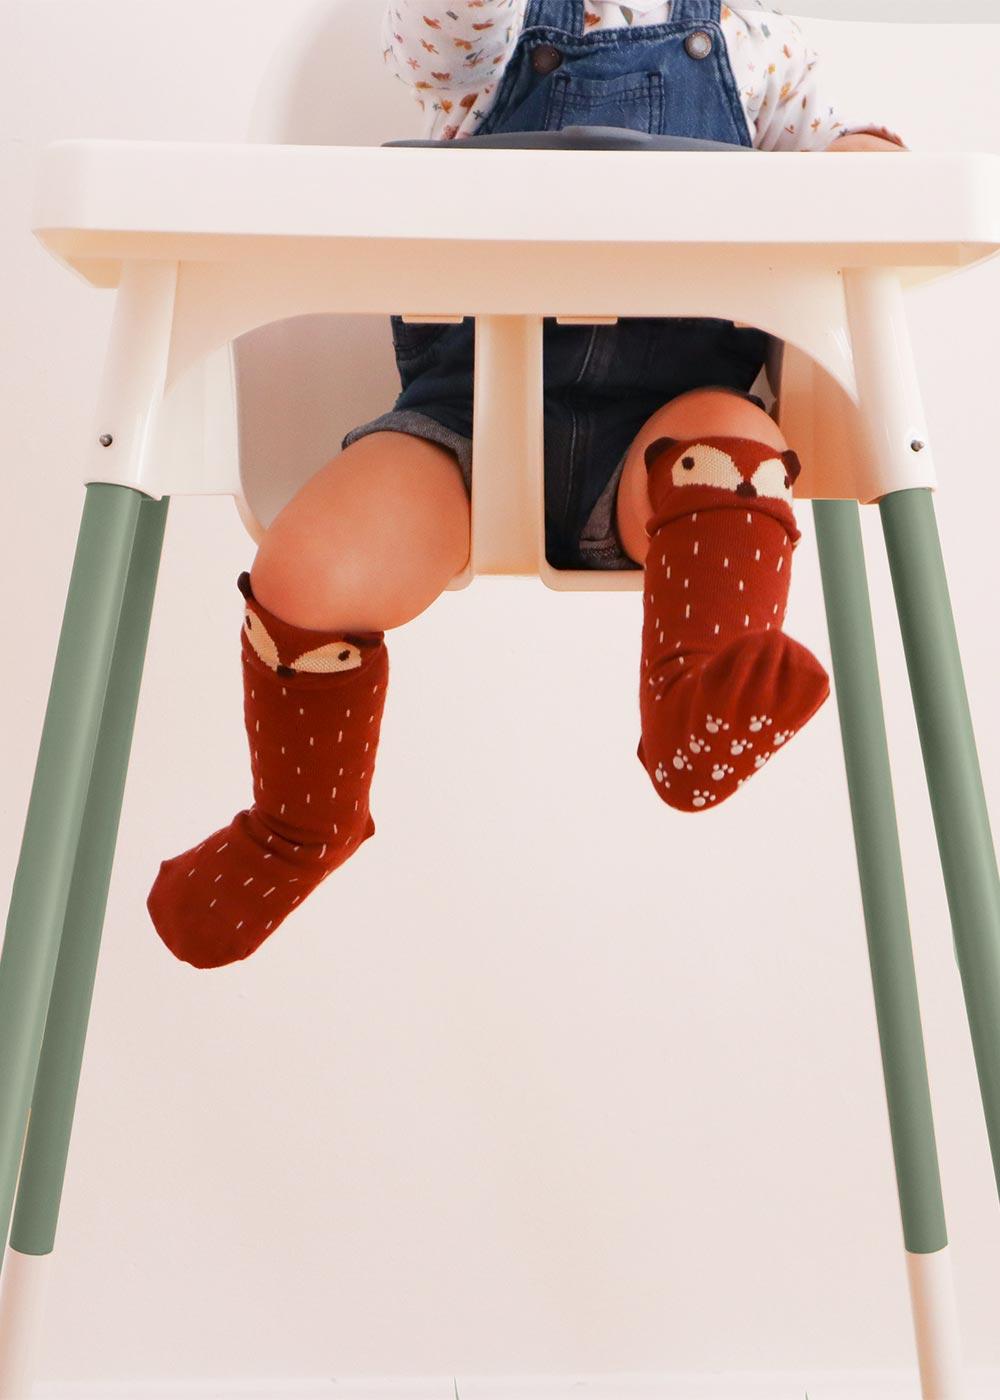 Ikea Antilop Hochstuhl Snygga Fot Eukalyptus Beine